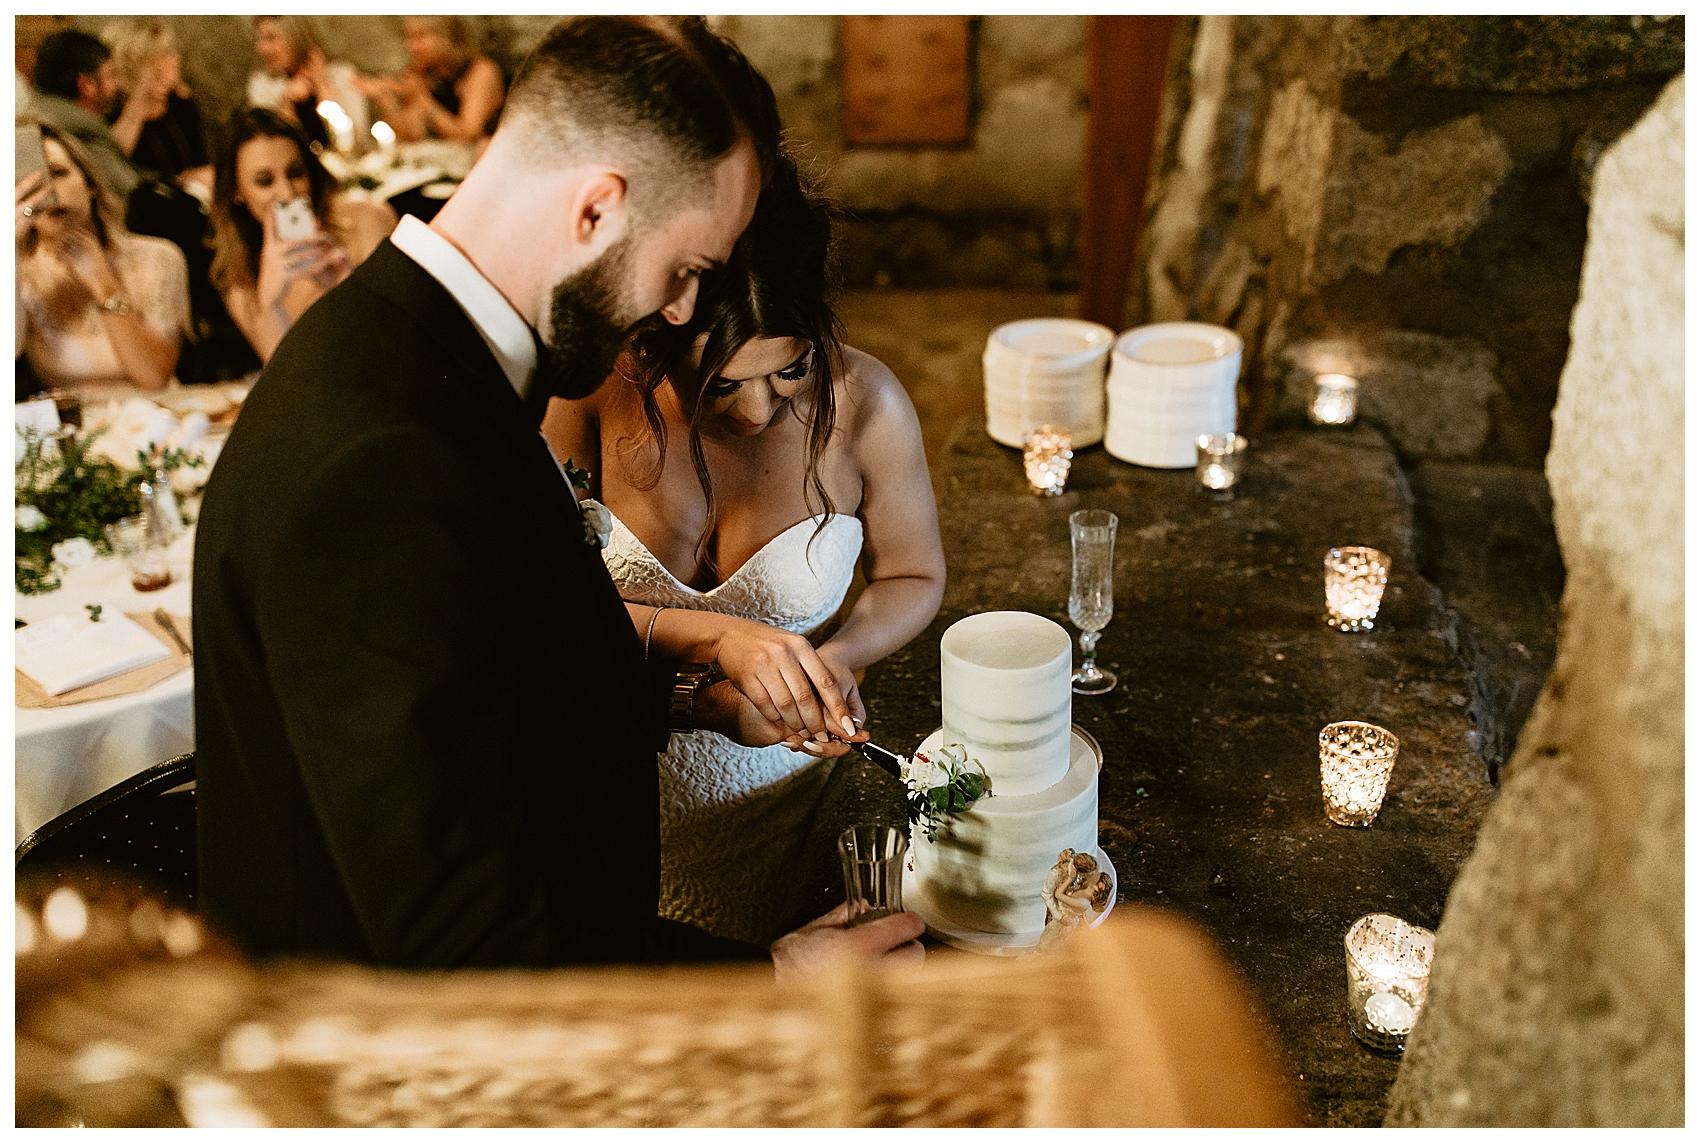 Chateau Rive Spokane Wedding Cassie Trottier Photography01105.jpg